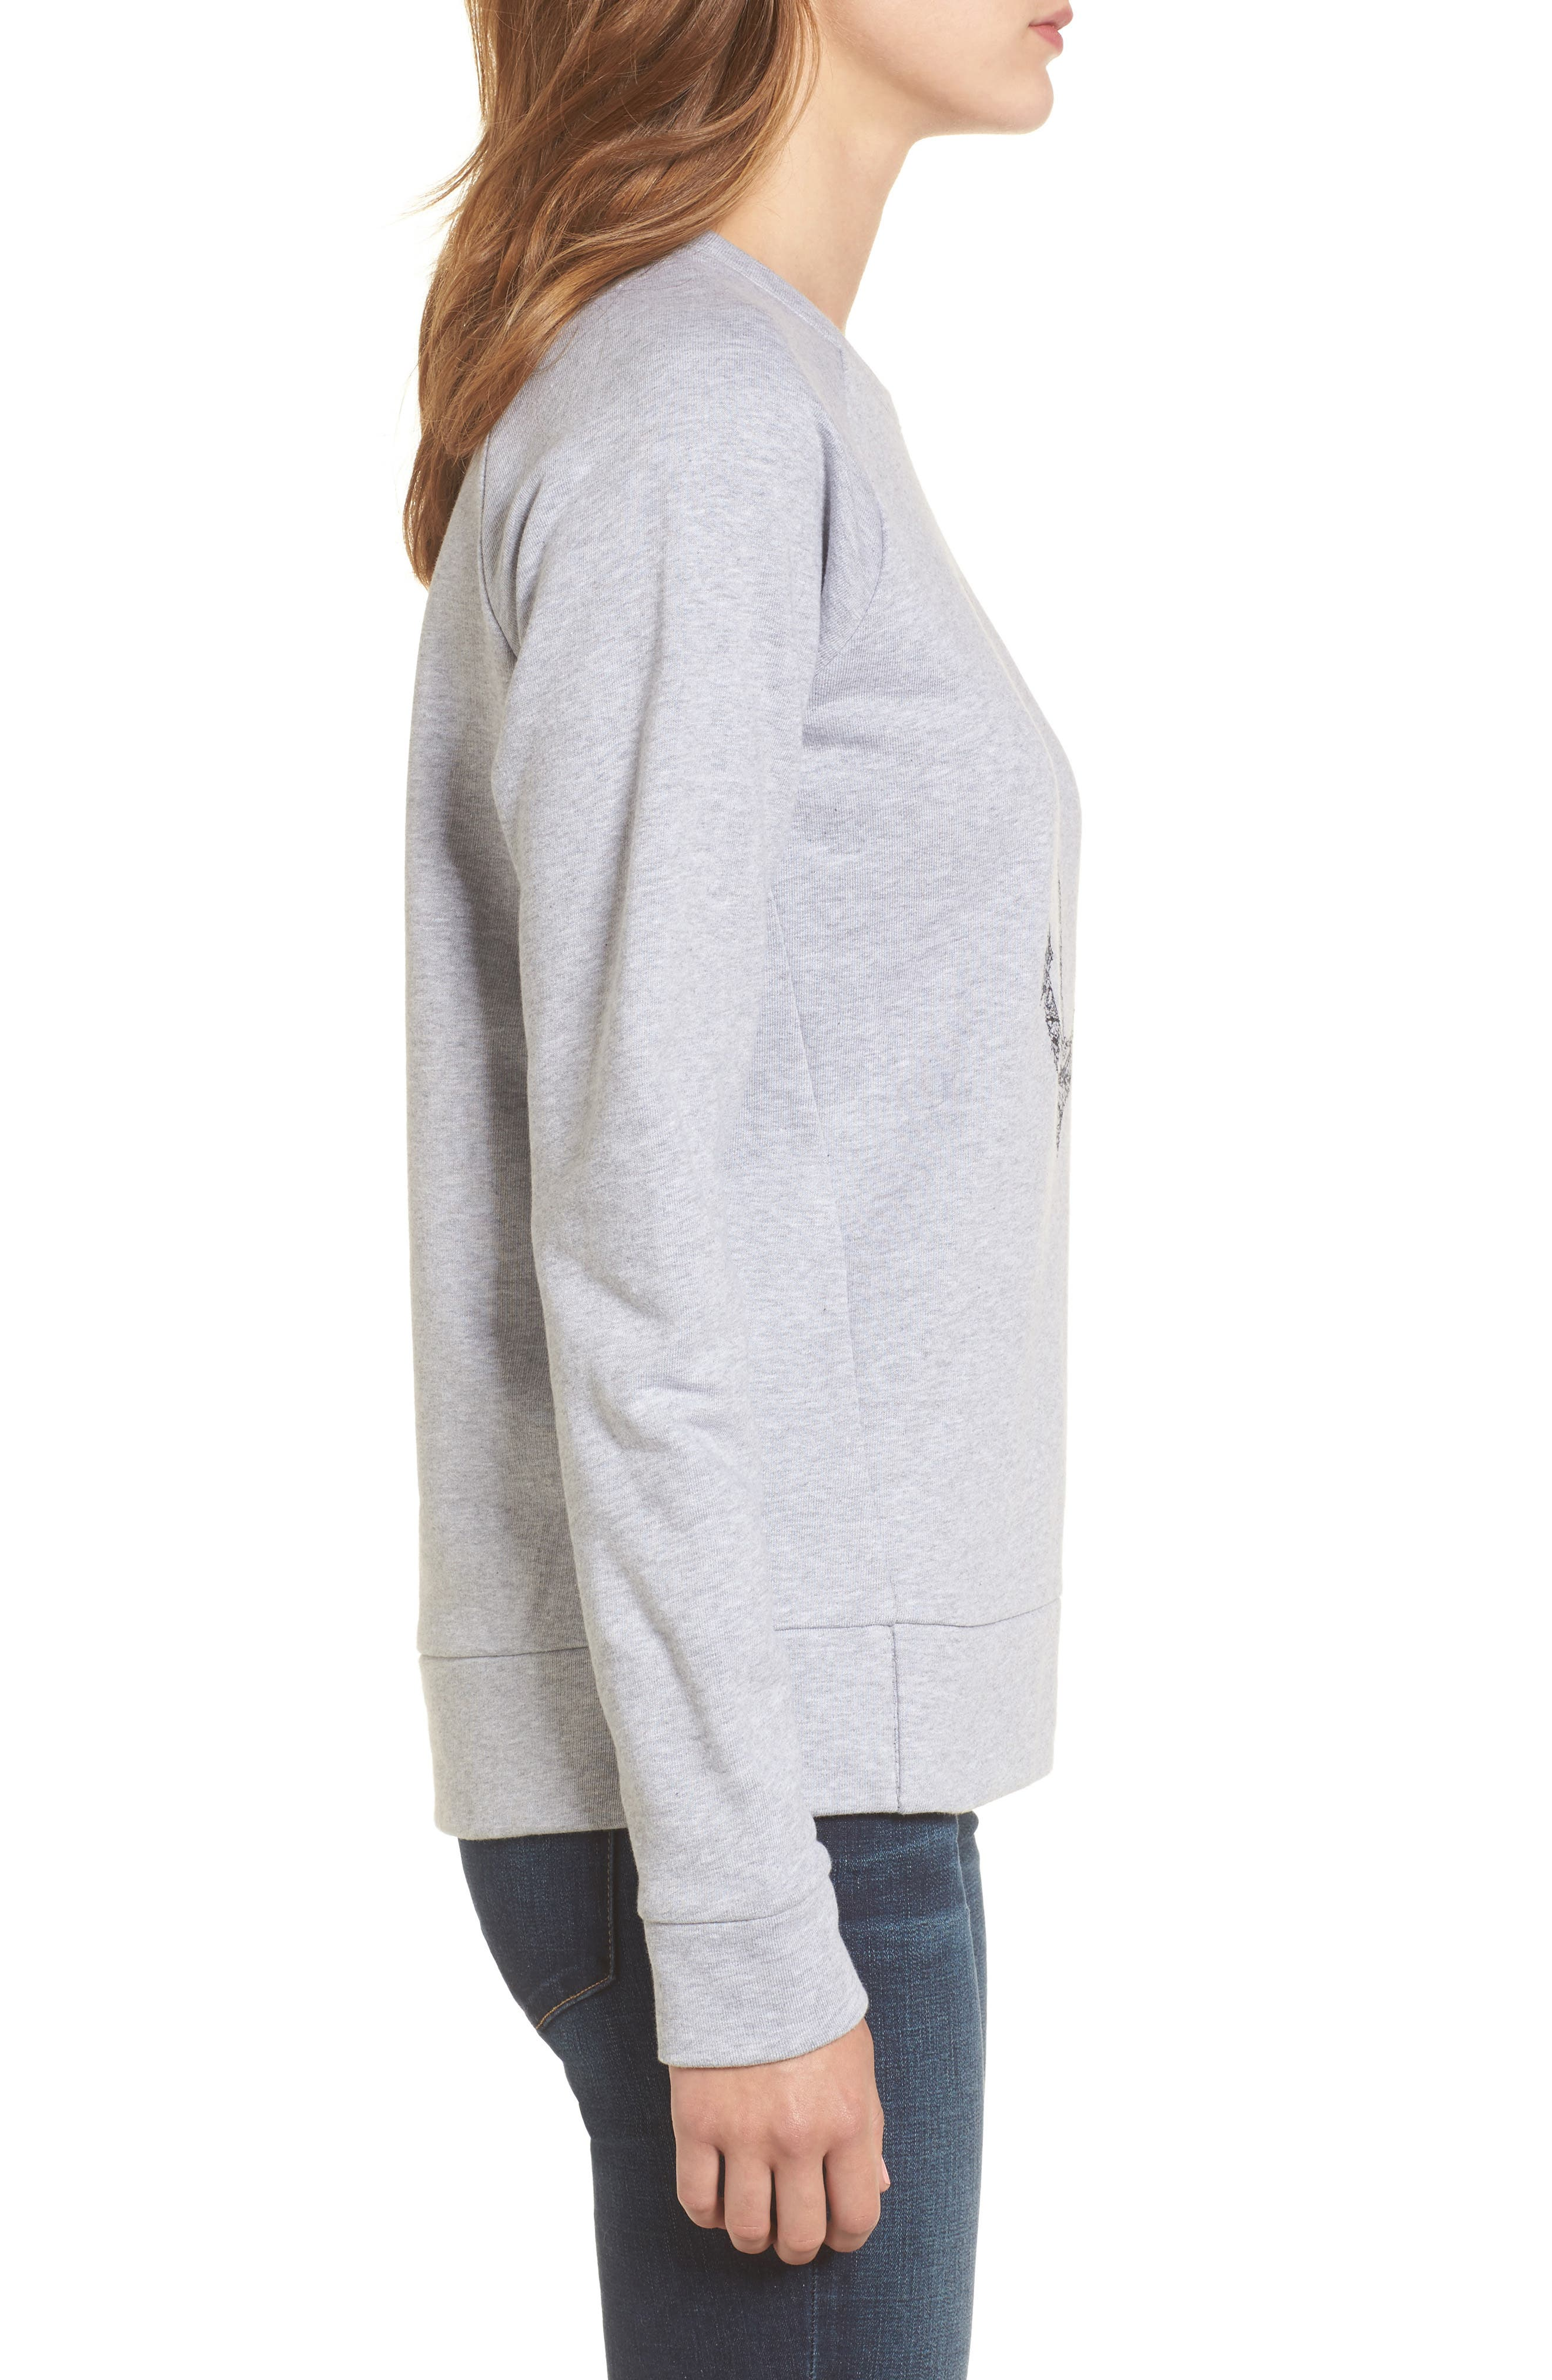 Wester Sweatshirt,                             Alternate thumbnail 3, color,                             Light Grey